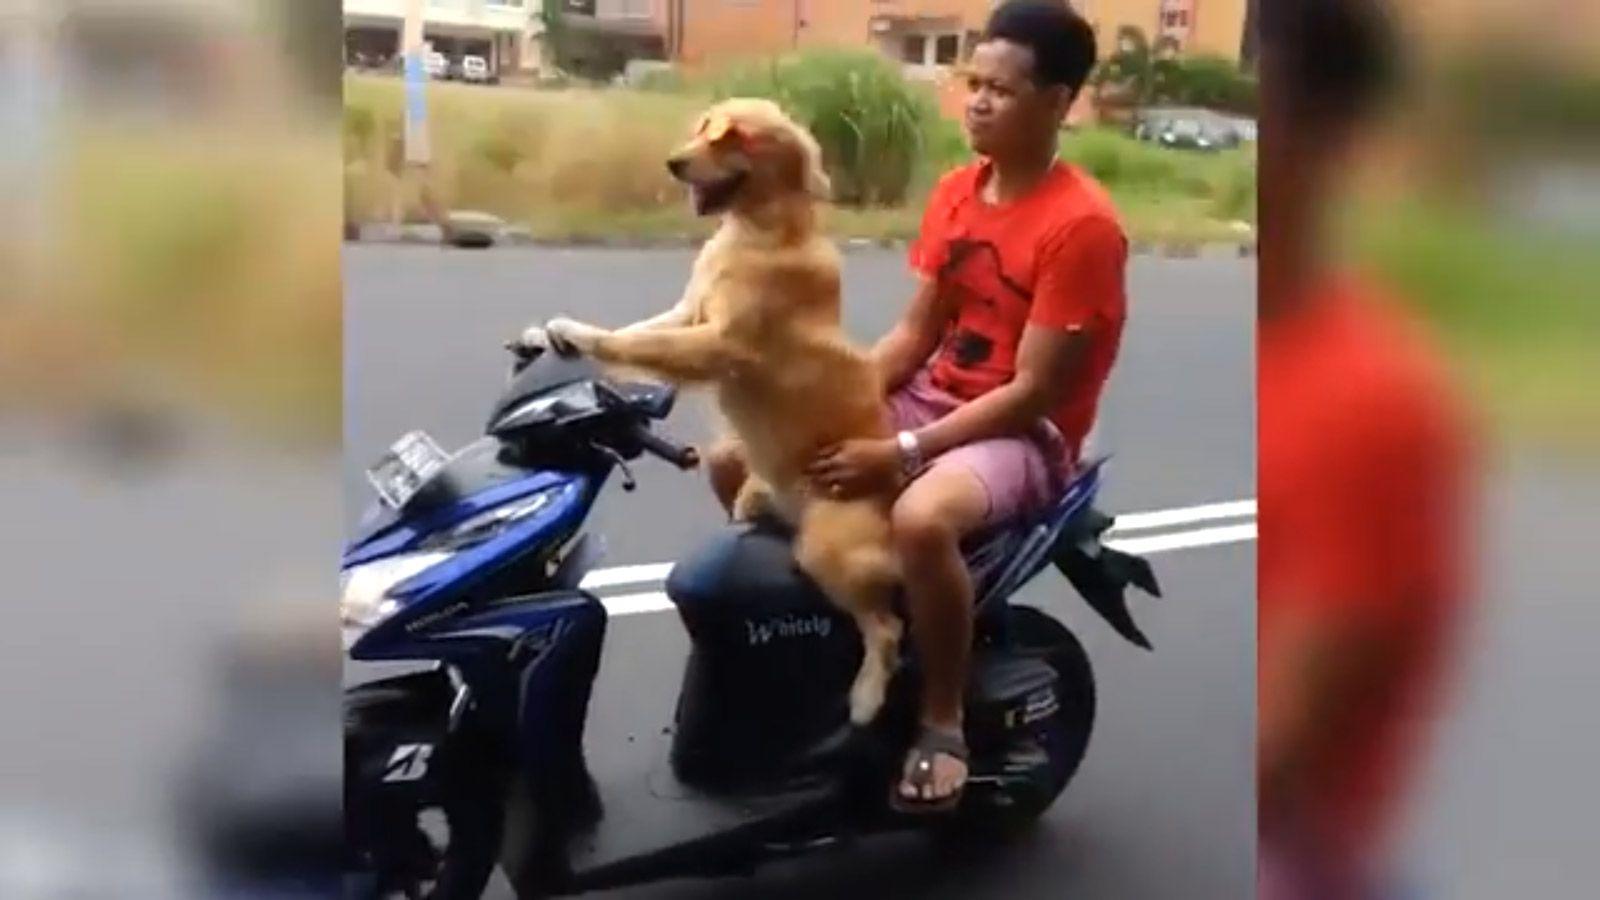 Cachorro pilota motocicleta na Indonésia